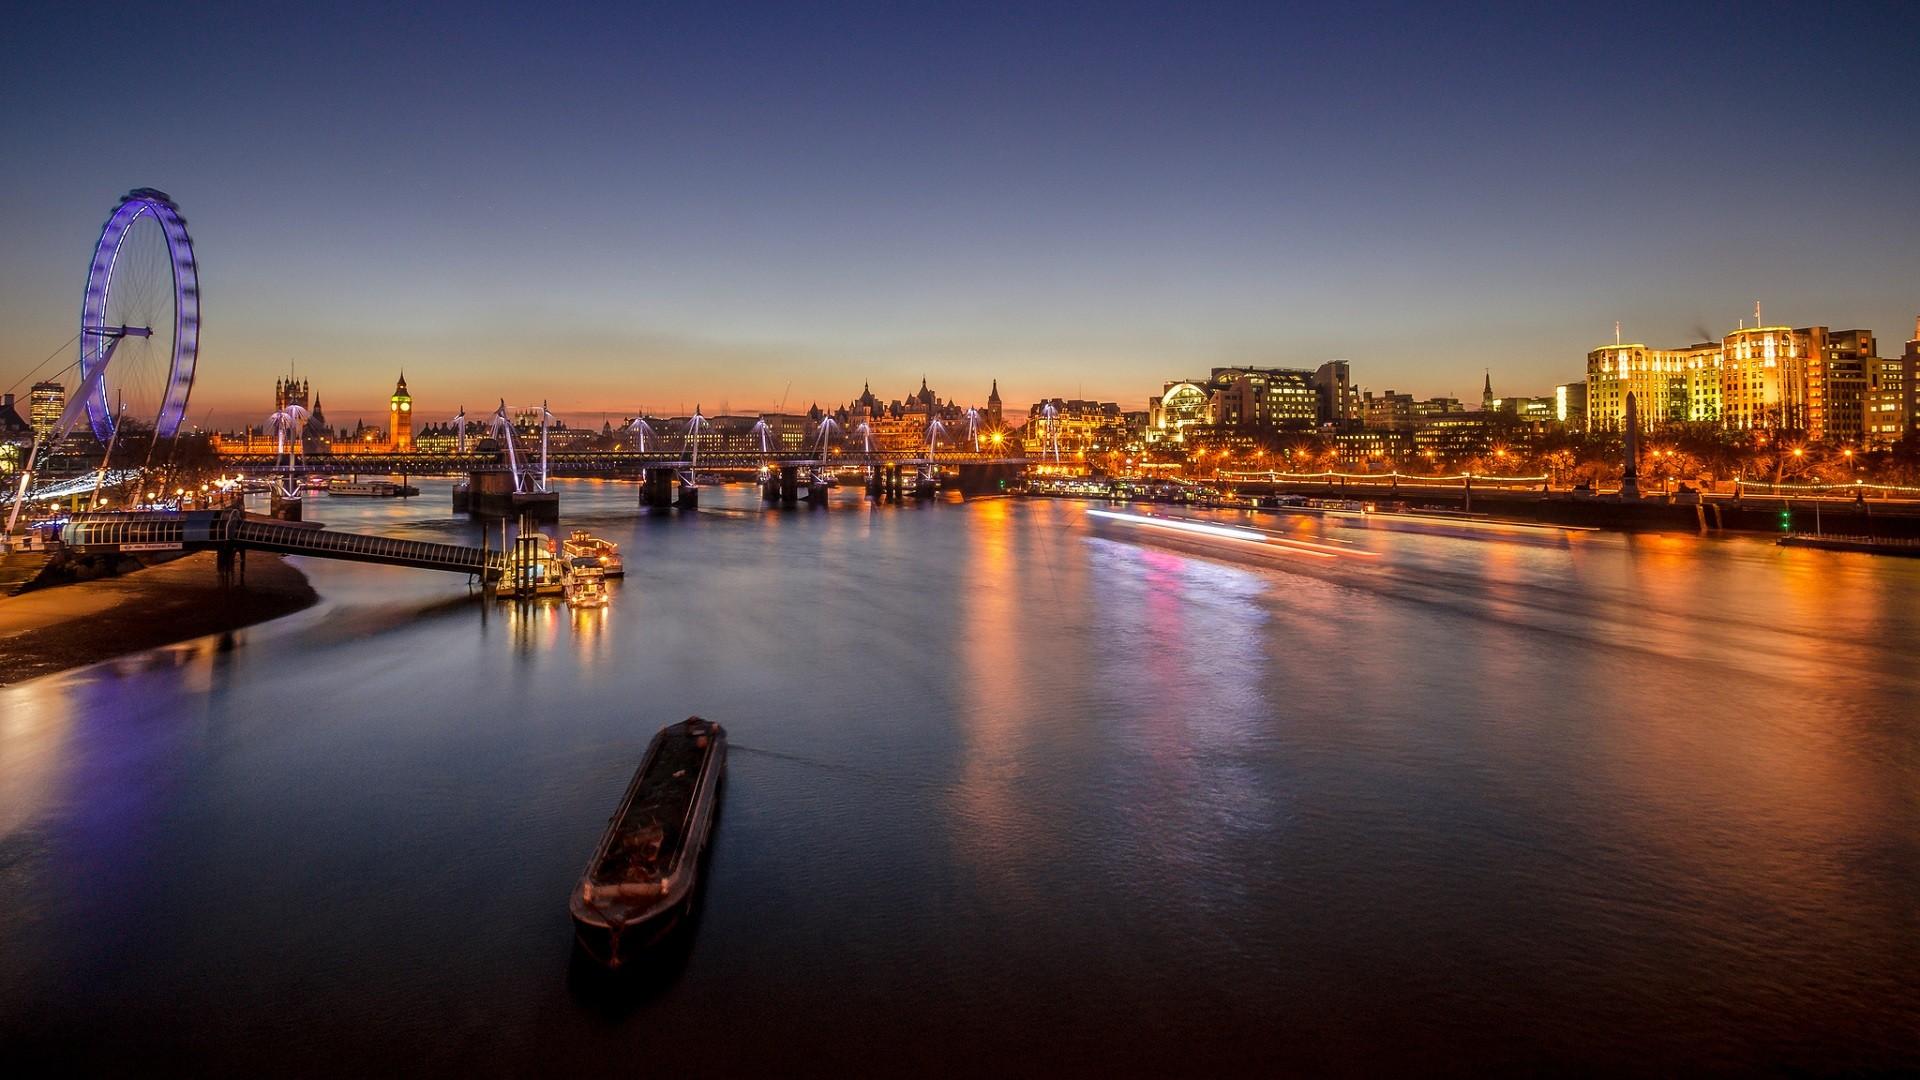 General 1920x1080 England London city cityscape river River Thames ferris wheel London Eye bridge lights city lights Big Ben